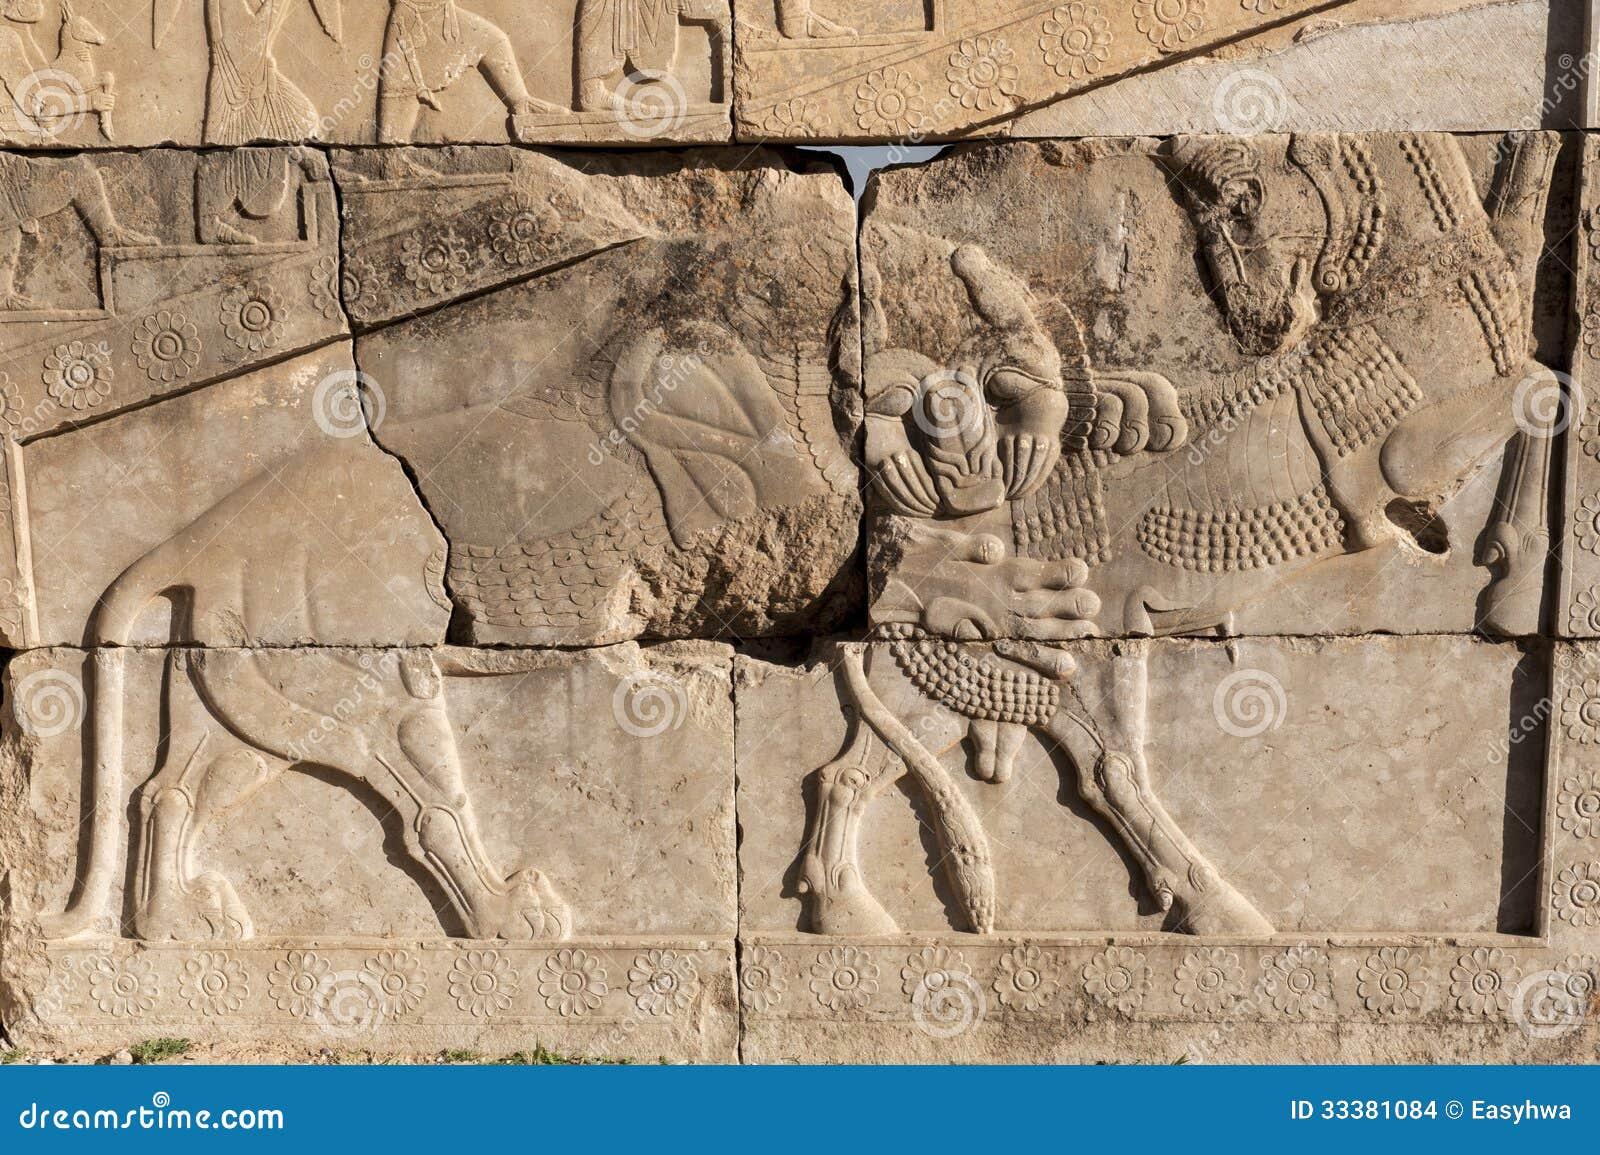 Bas relief of persepolis ruins,shiraz iran